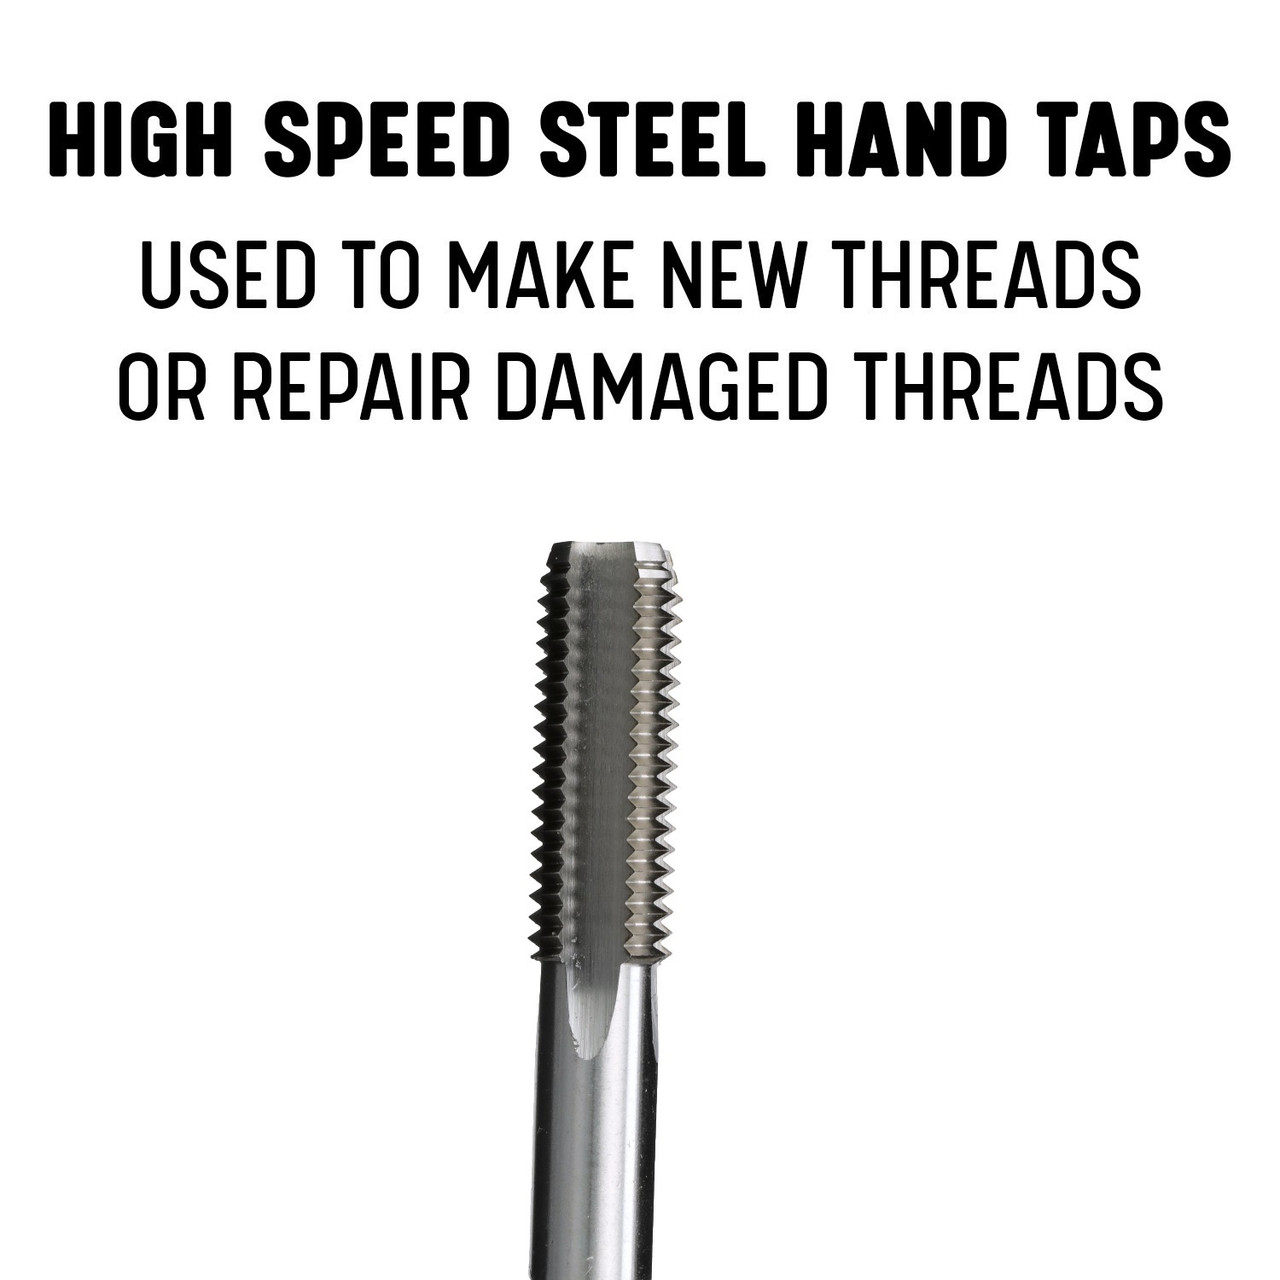 Spiral Point Special Thread Hand Tap 5//16-32 High Speed